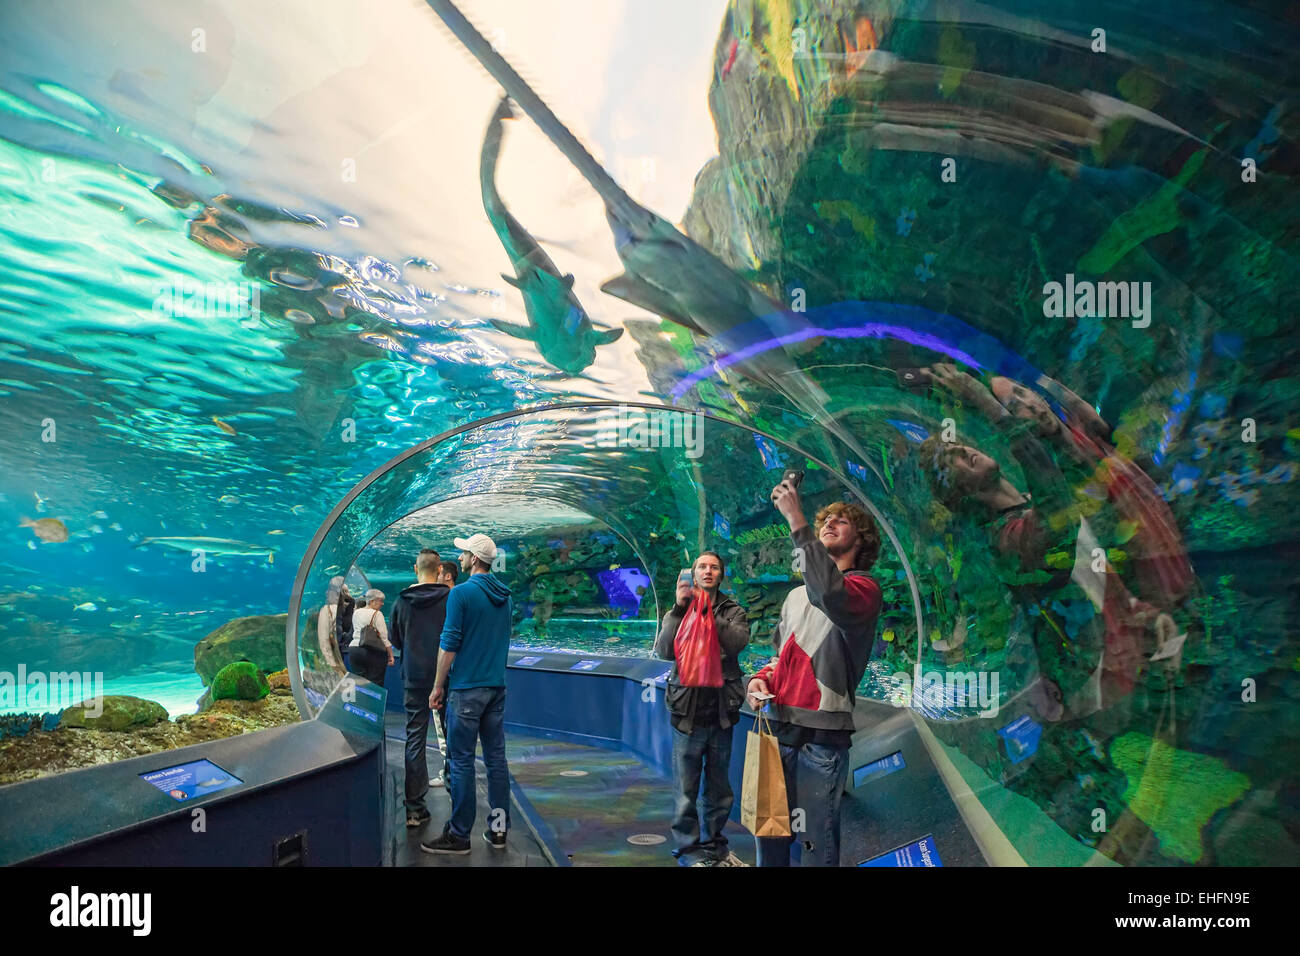 Ripleys aquarium in toronto ontario canada tourist for Places that sell fish near me